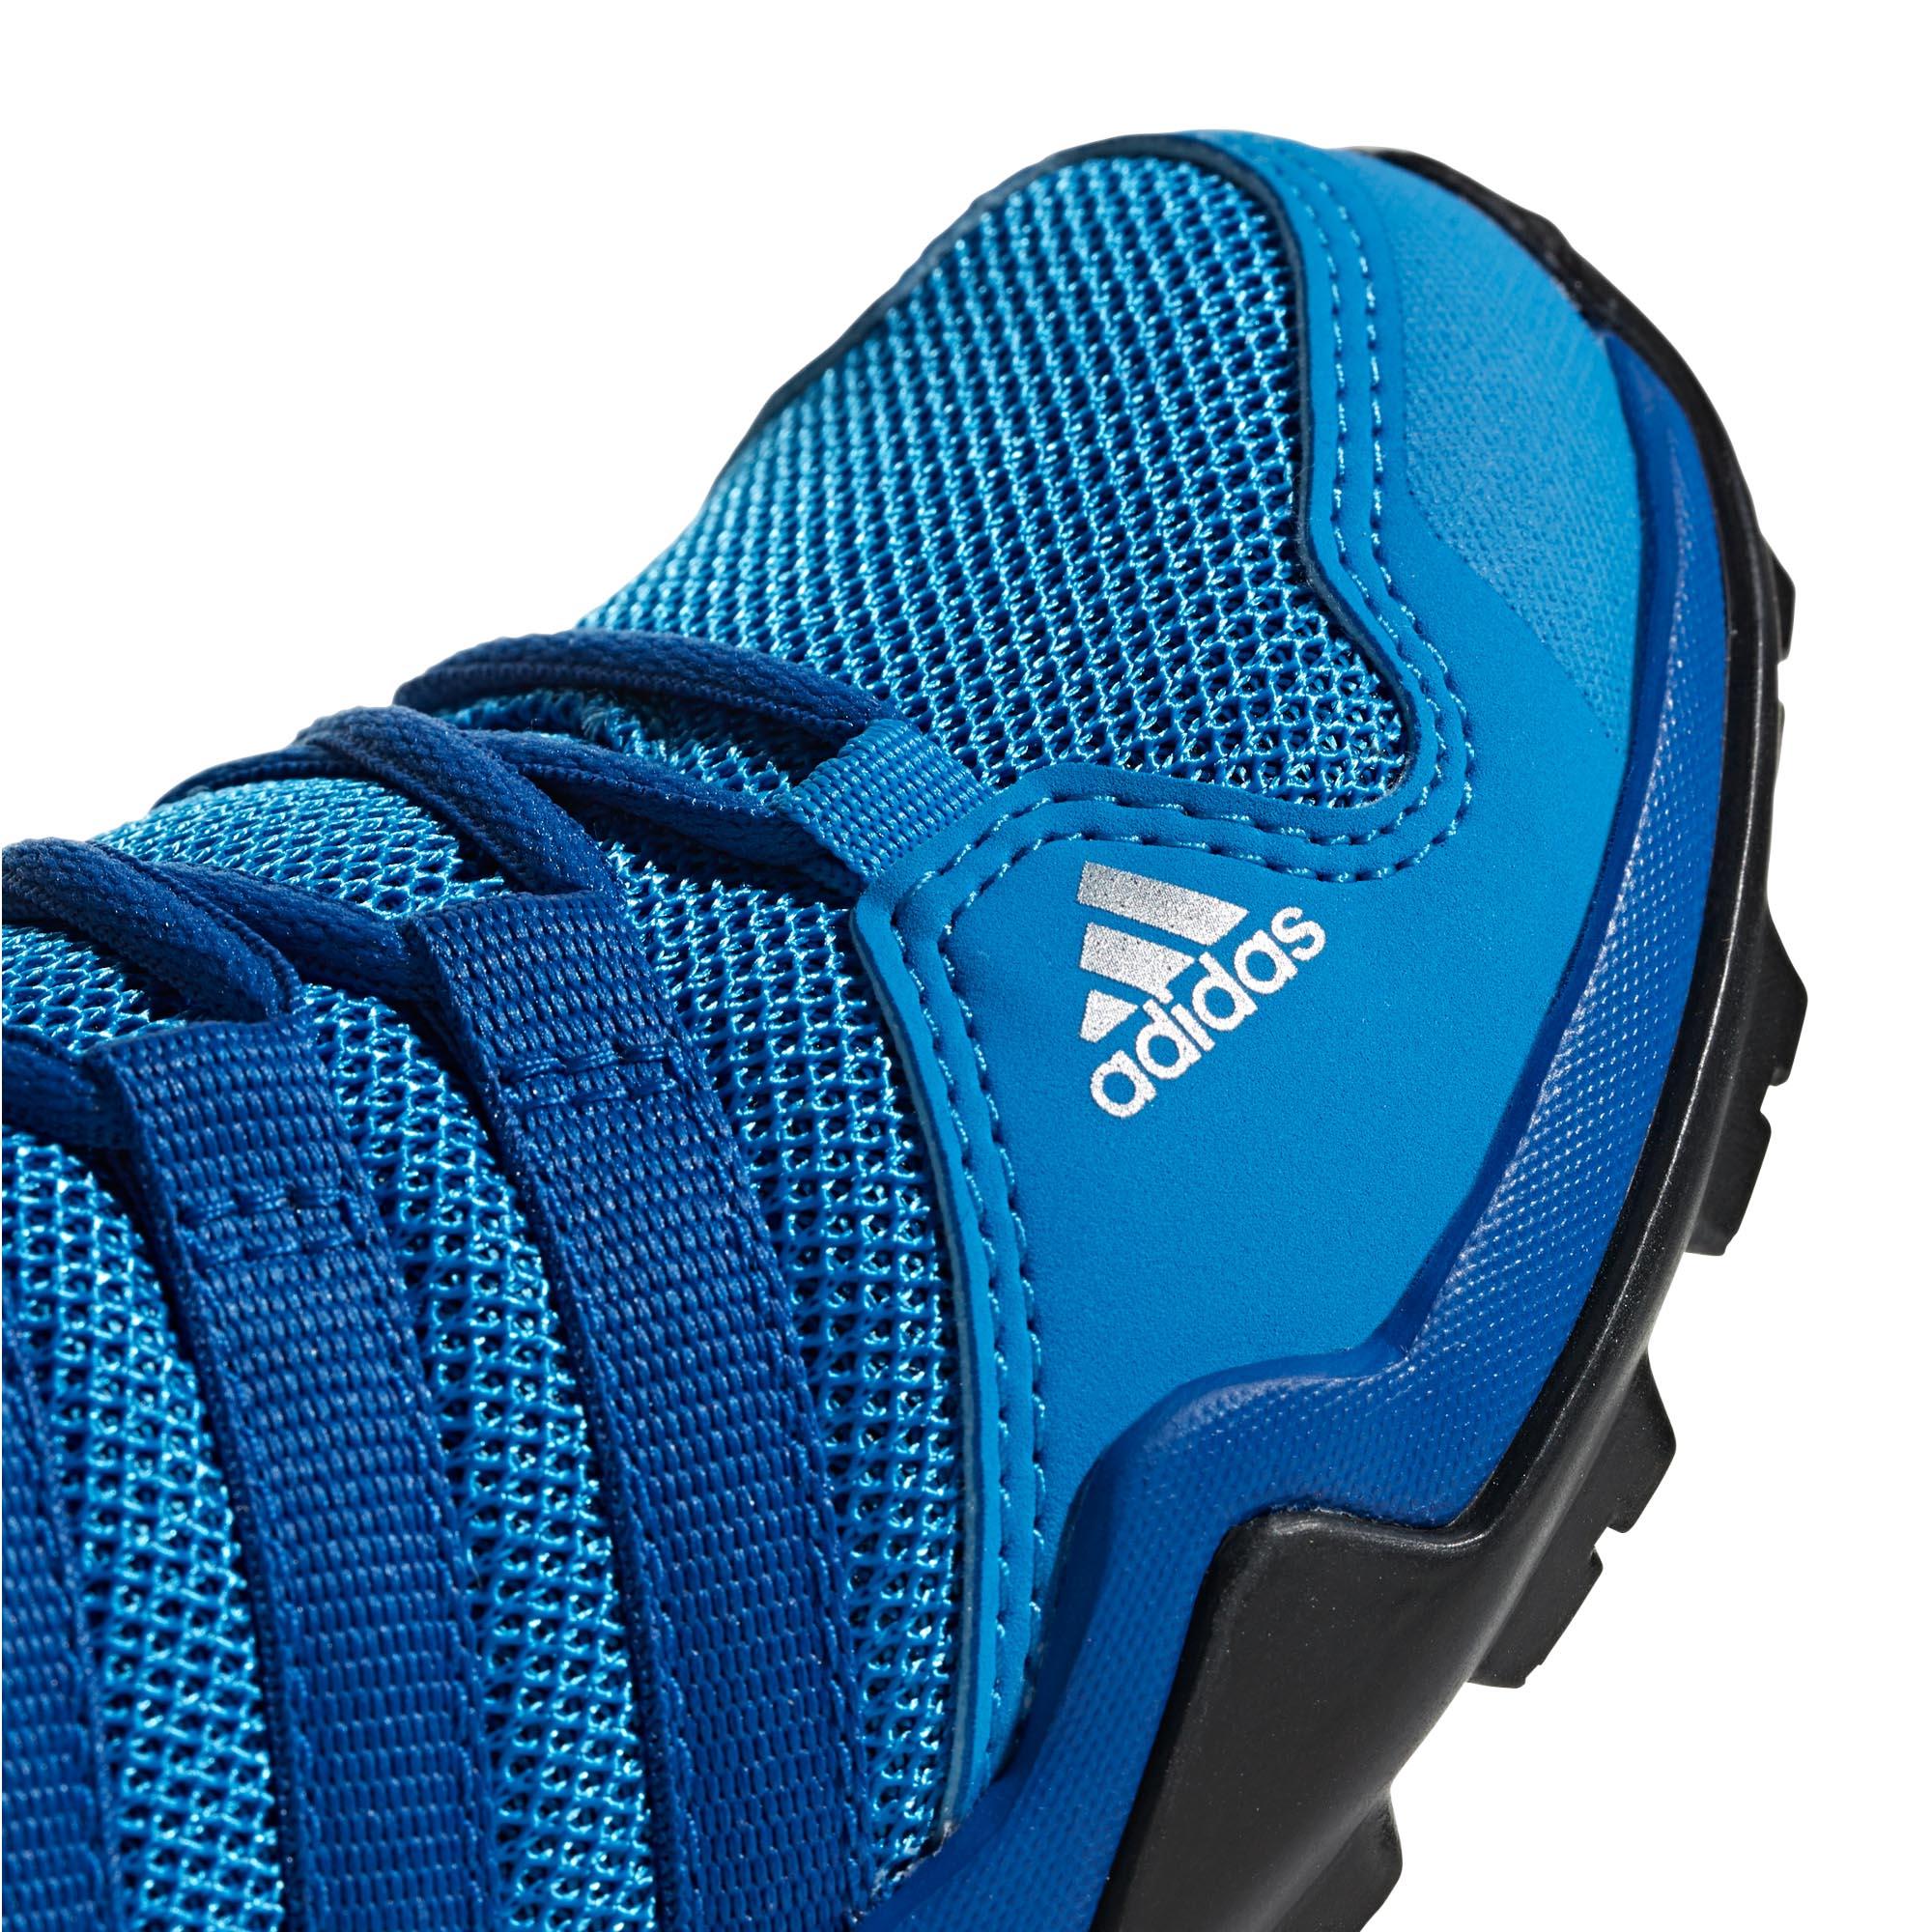 adidas-Terrex-AX2R-Kids-Boys-Trail-Hiking-Trainer-Shoe-Blue-Black thumbnail 8